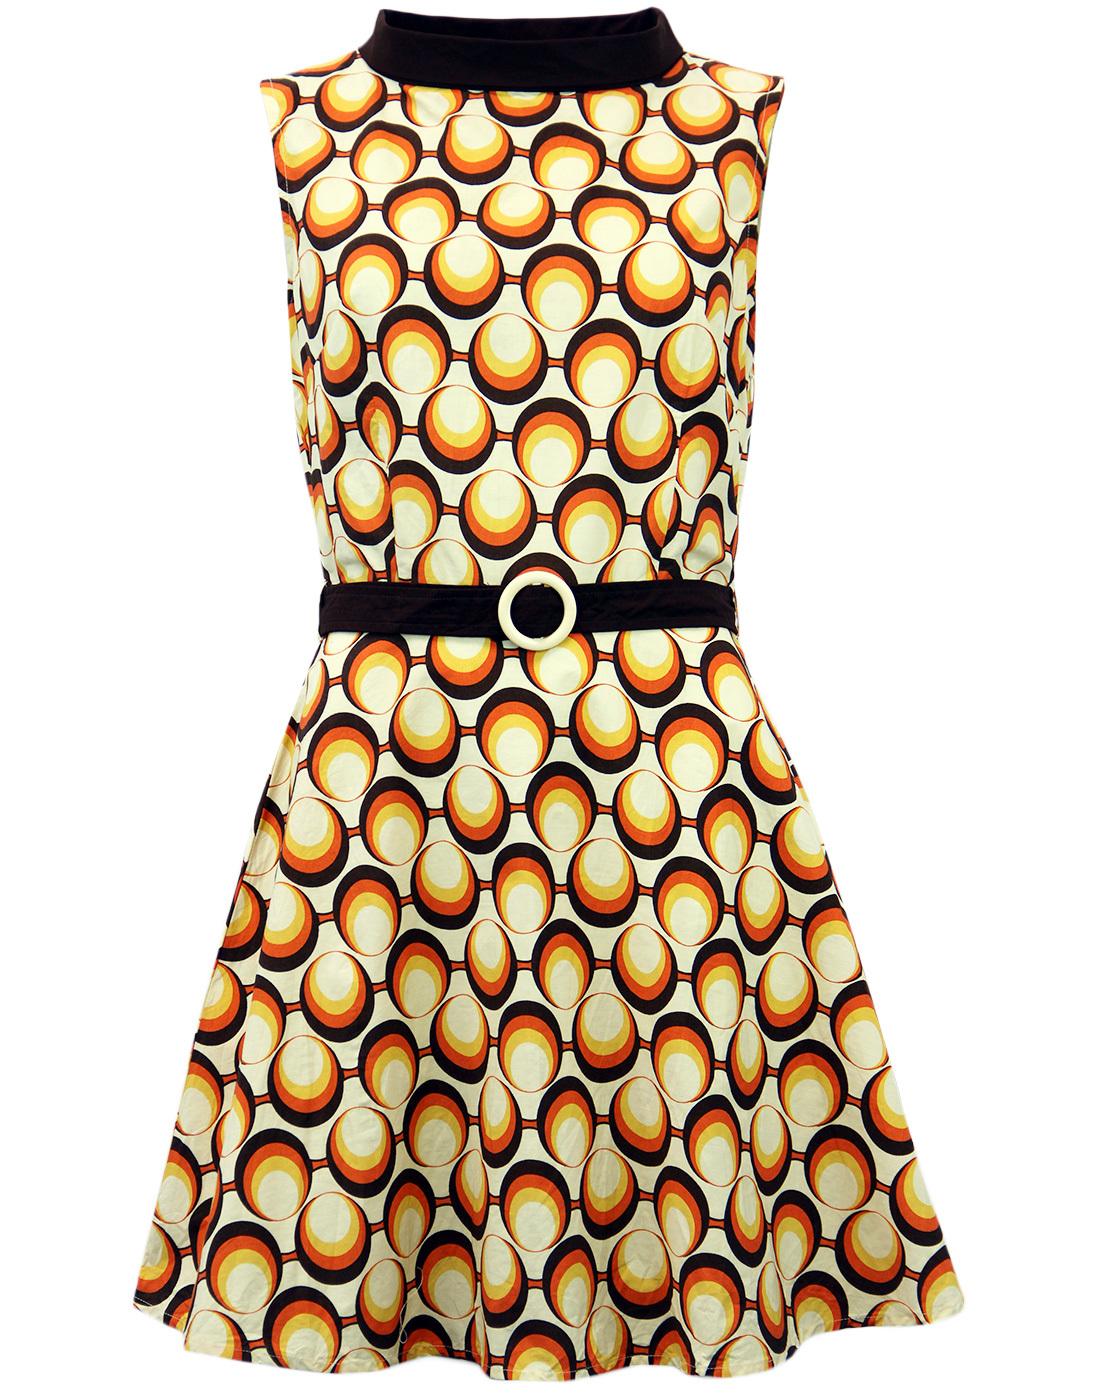 Minnie MADCAP ENGLAND Retro Mod 60s Geo Mini Dress